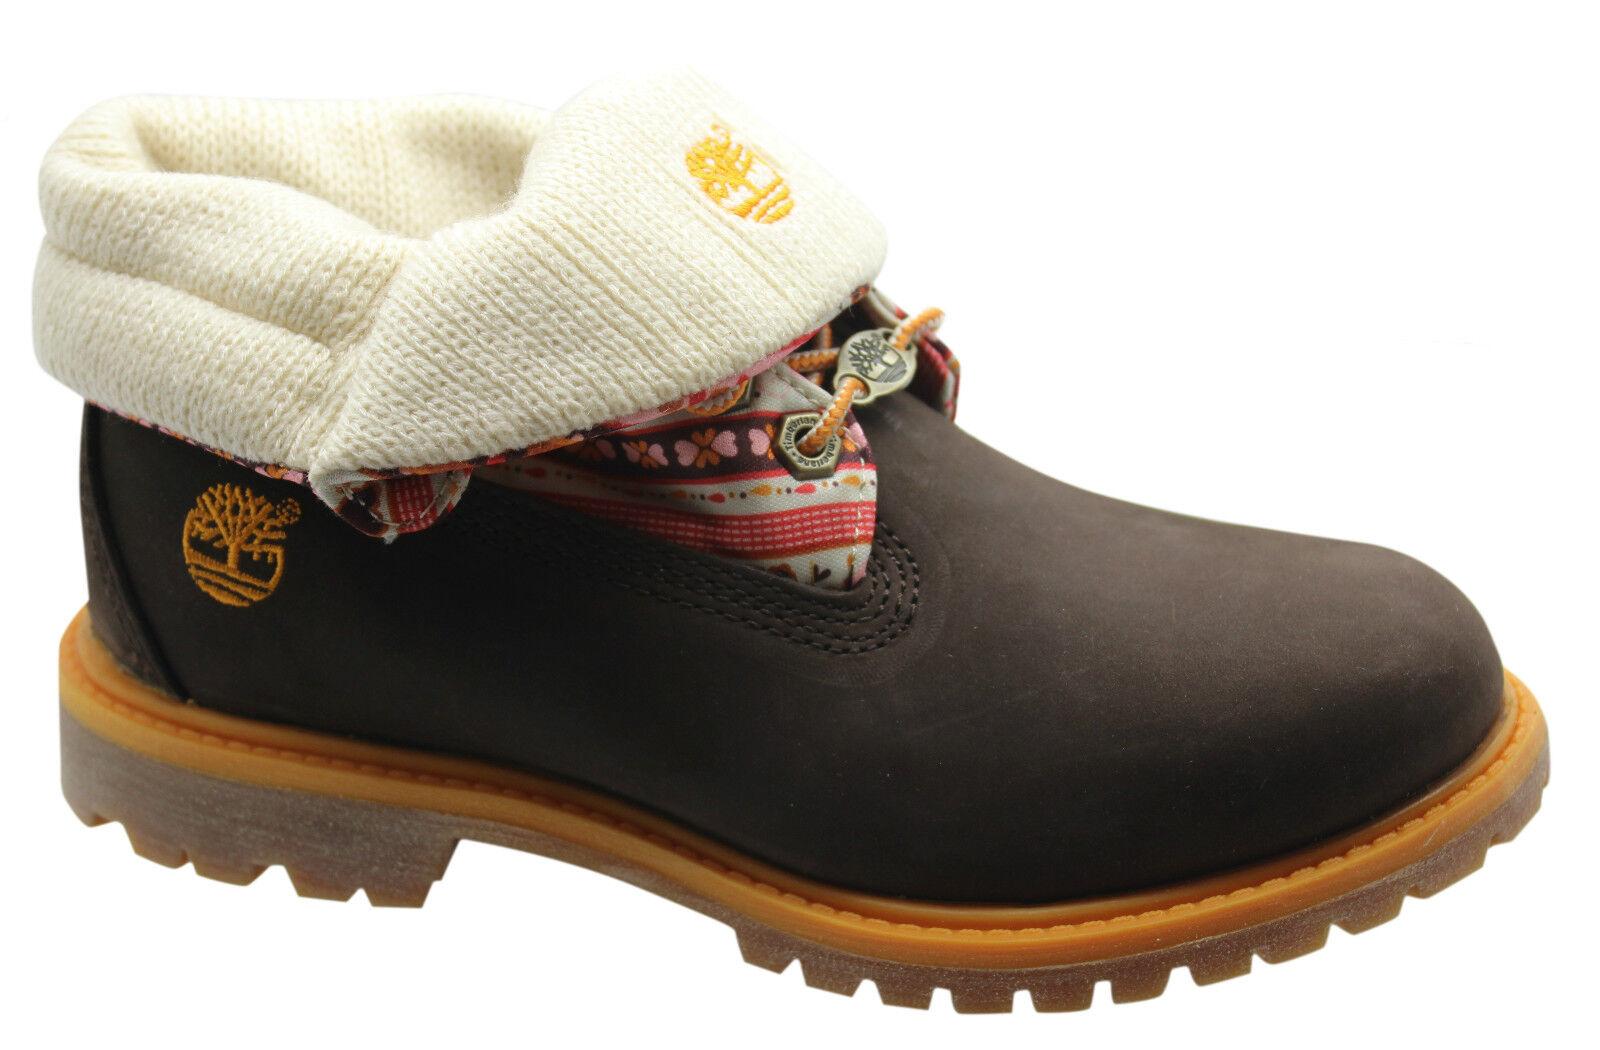 86641 Stivale Stivaletto ceniza Yasmin (sin Caja) Scarpa Stivale 86641 mujer Botas Zapatos De Mujer 8d57ee